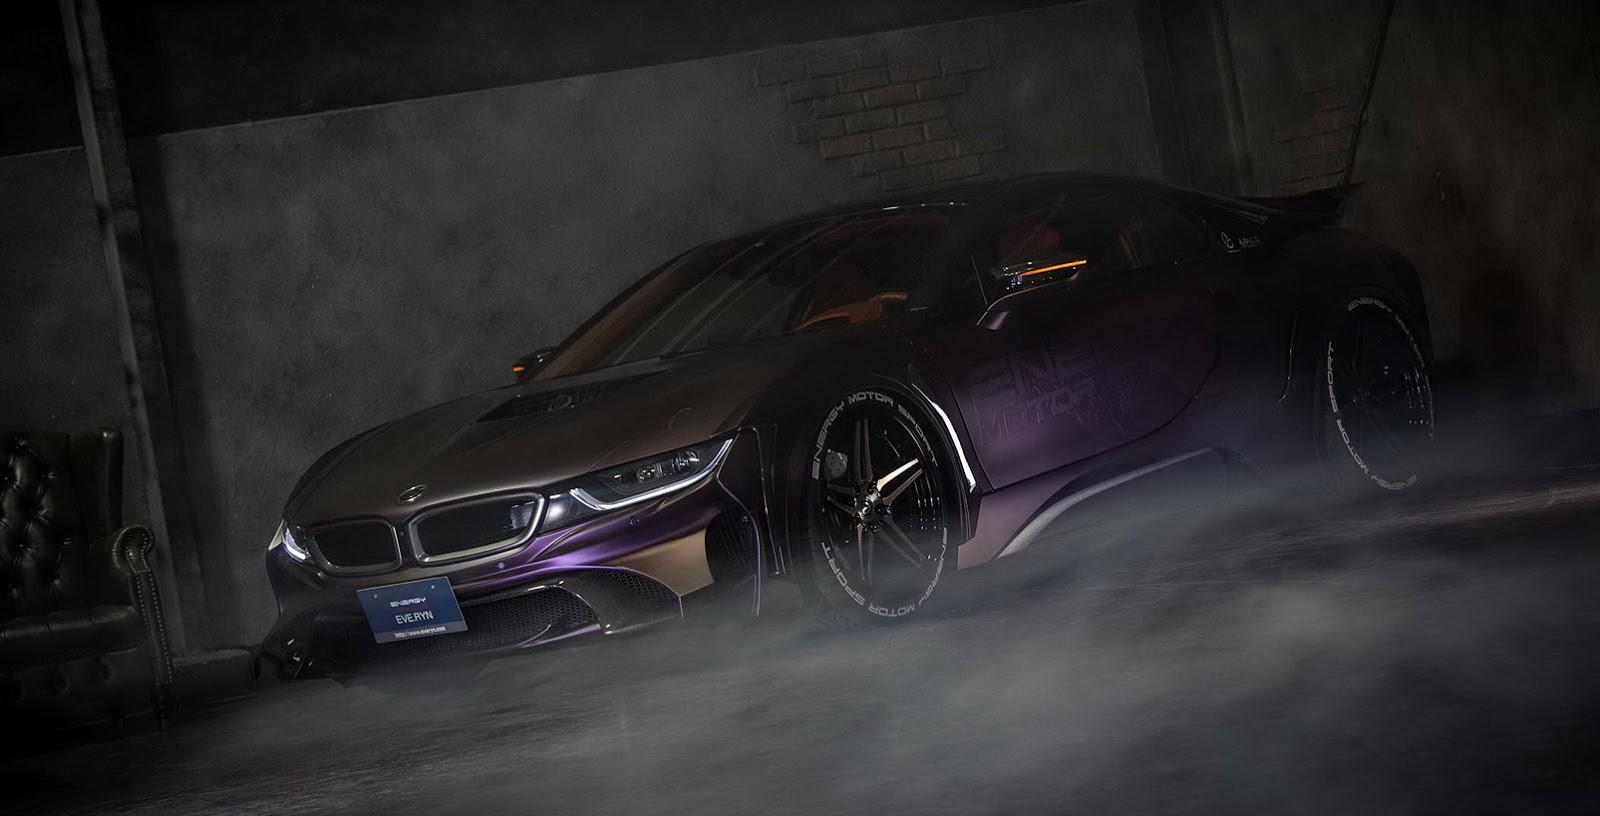 Video Eve Ryn Bmw I8 Dark Knight Edition Looks Insane